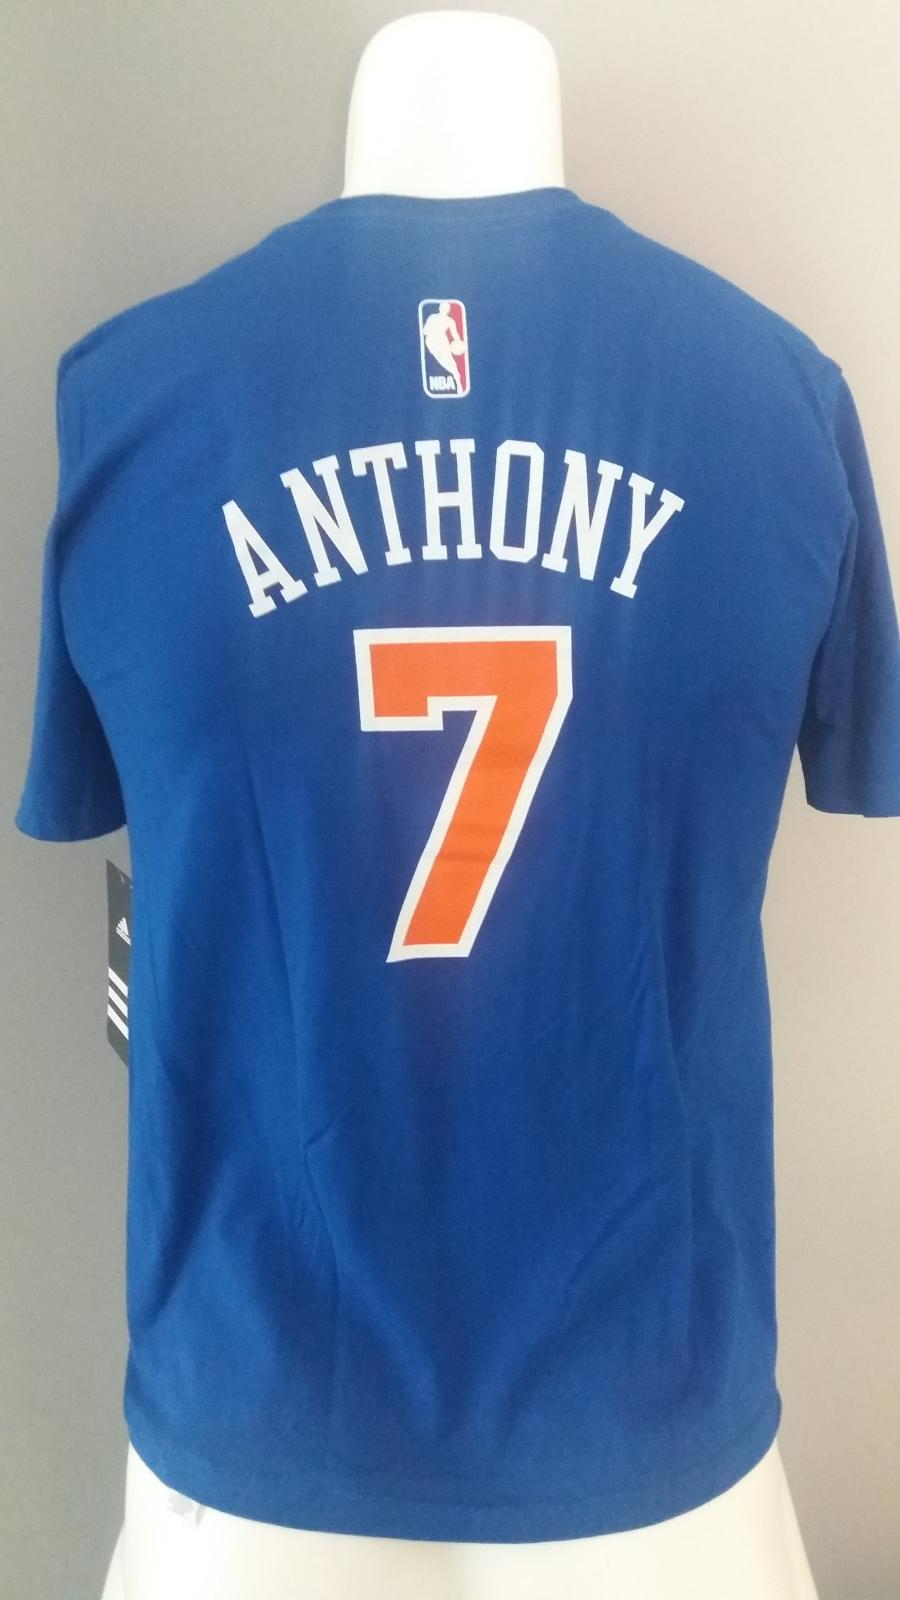 Jersey - T-shirt - Joven - Carlmelo Anthony - New York Knicks - Alternate - Adidas